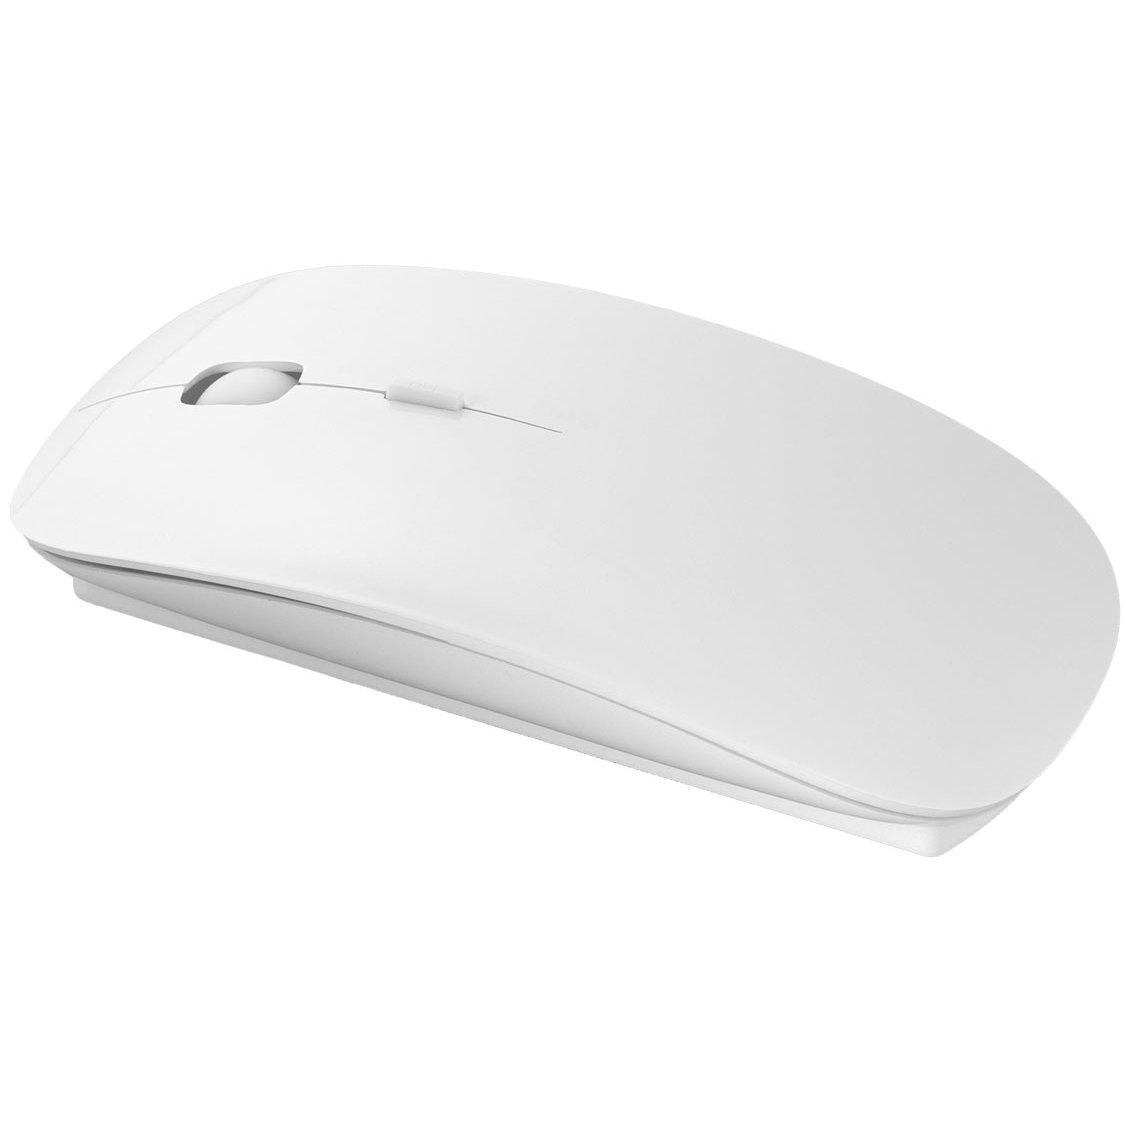 Bullet Menlo wireless computer mouse